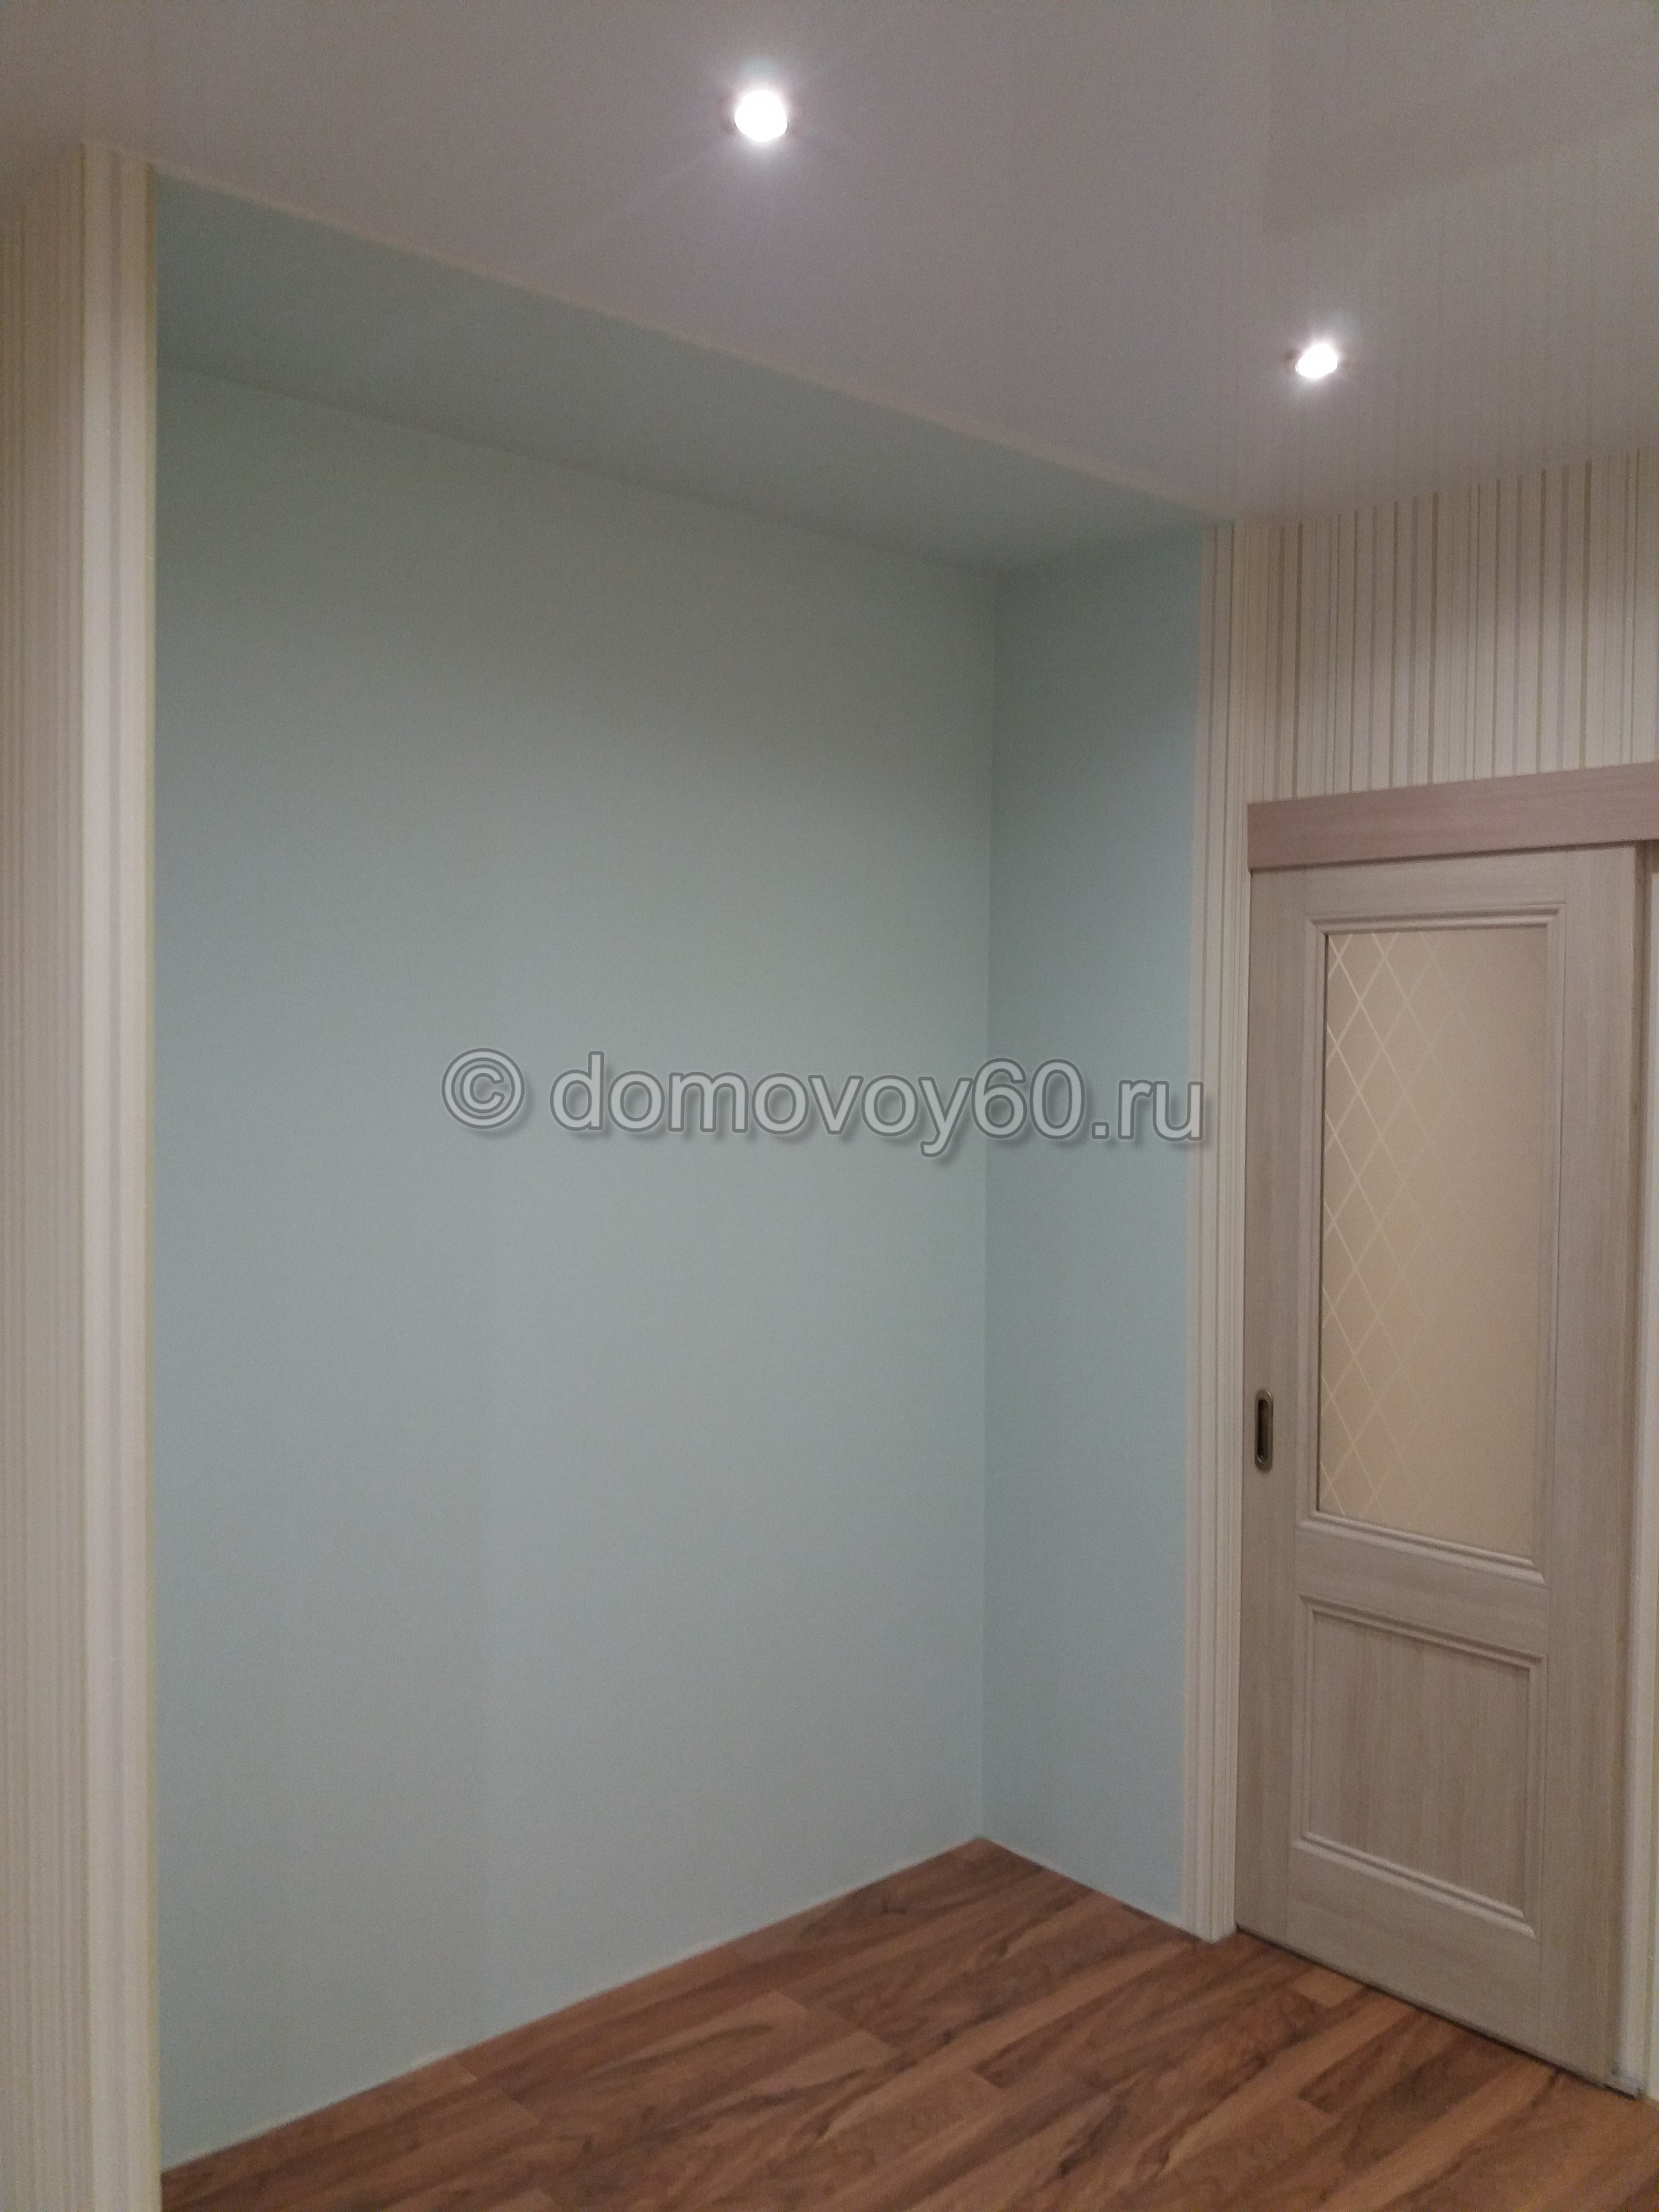 domovoy60-094